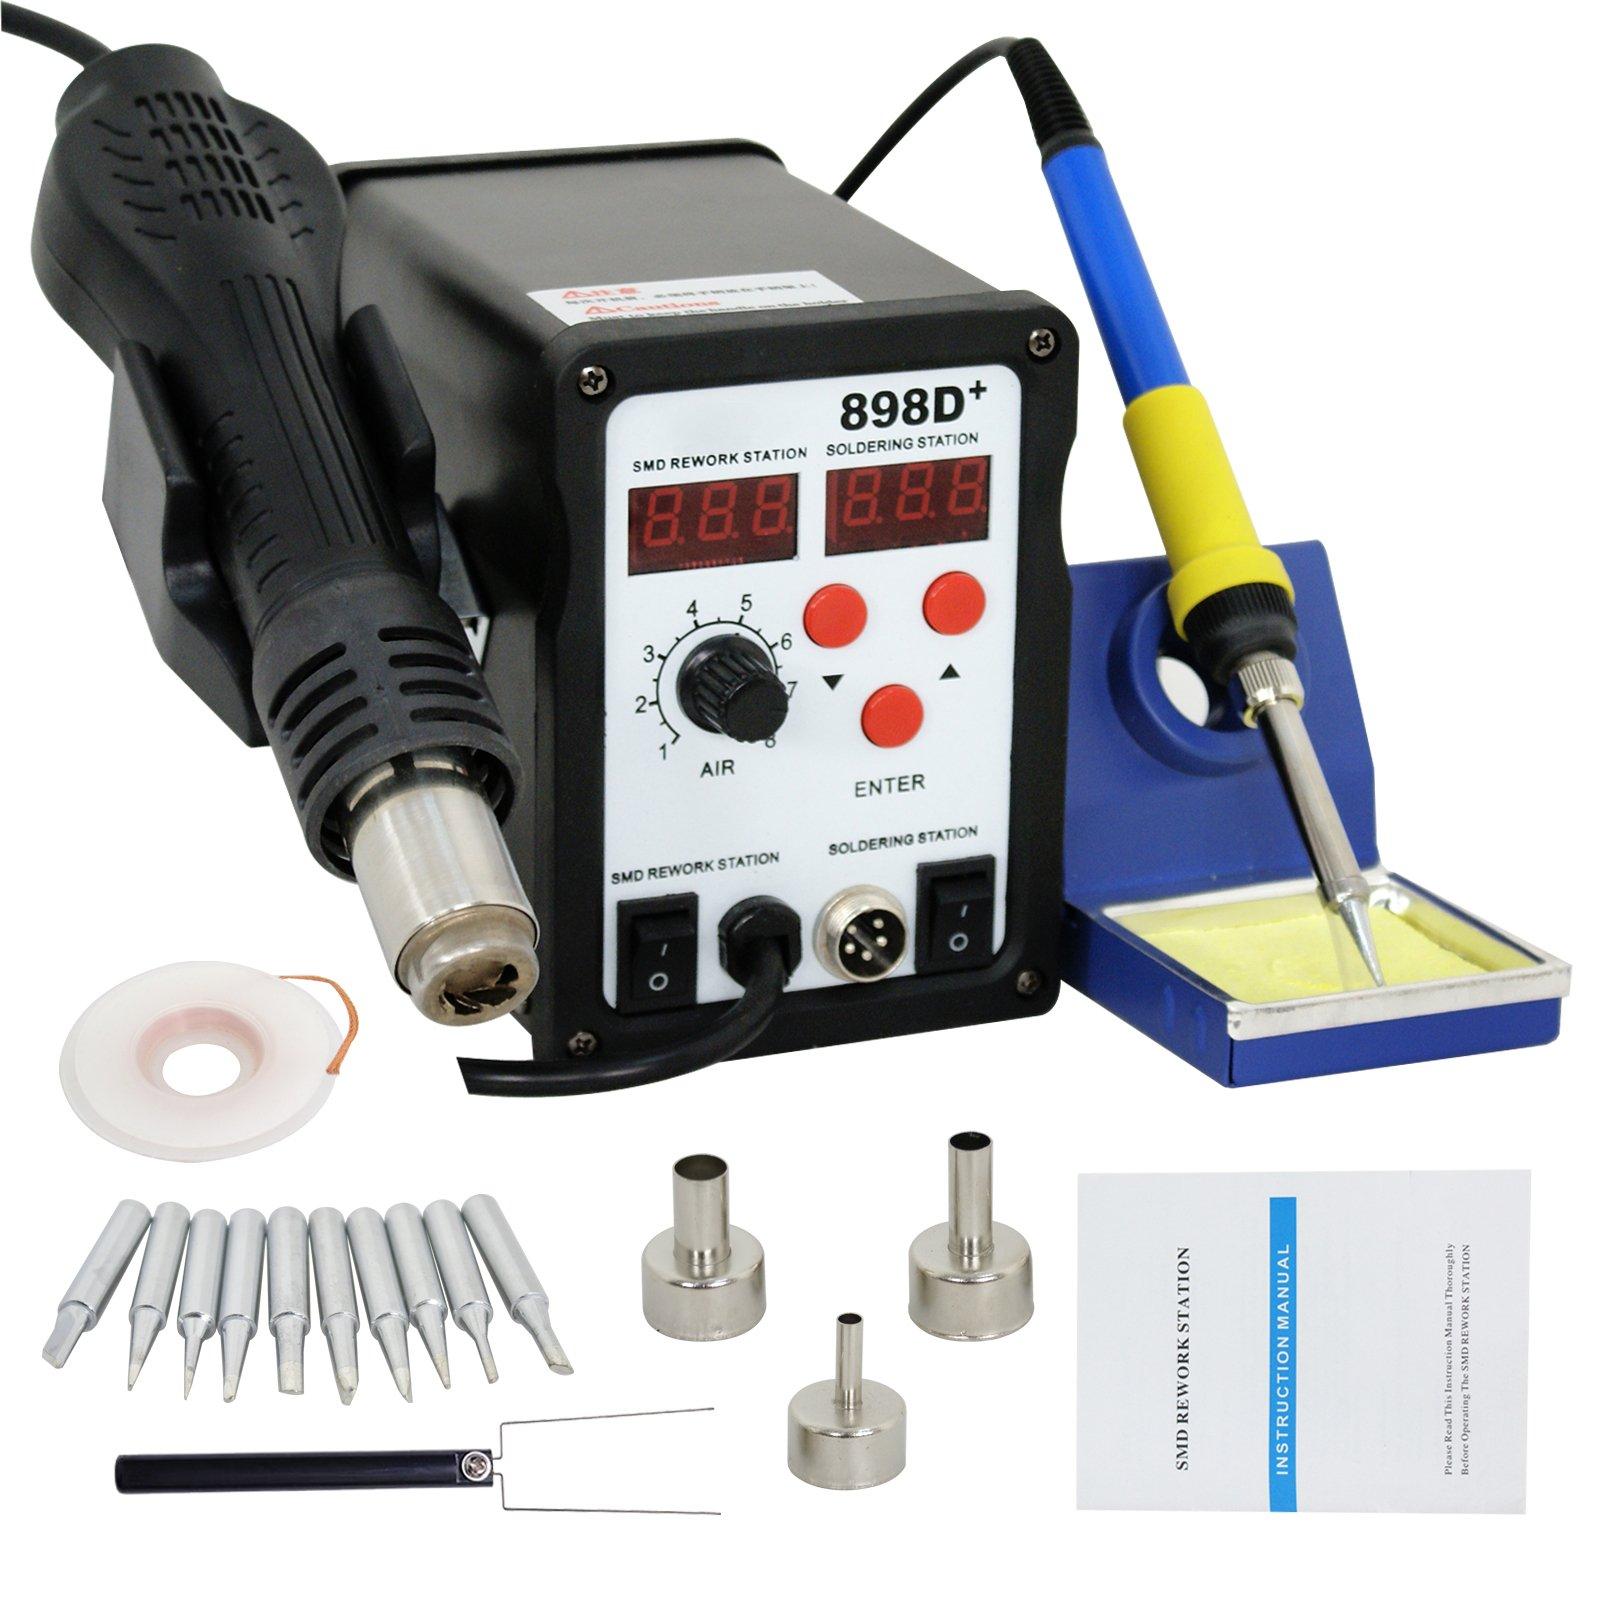 Smartxchoices 898D+ Digital Soldering Station Hot Air Rework Station SMD Desoldering Welder W/Accessories (898D+)